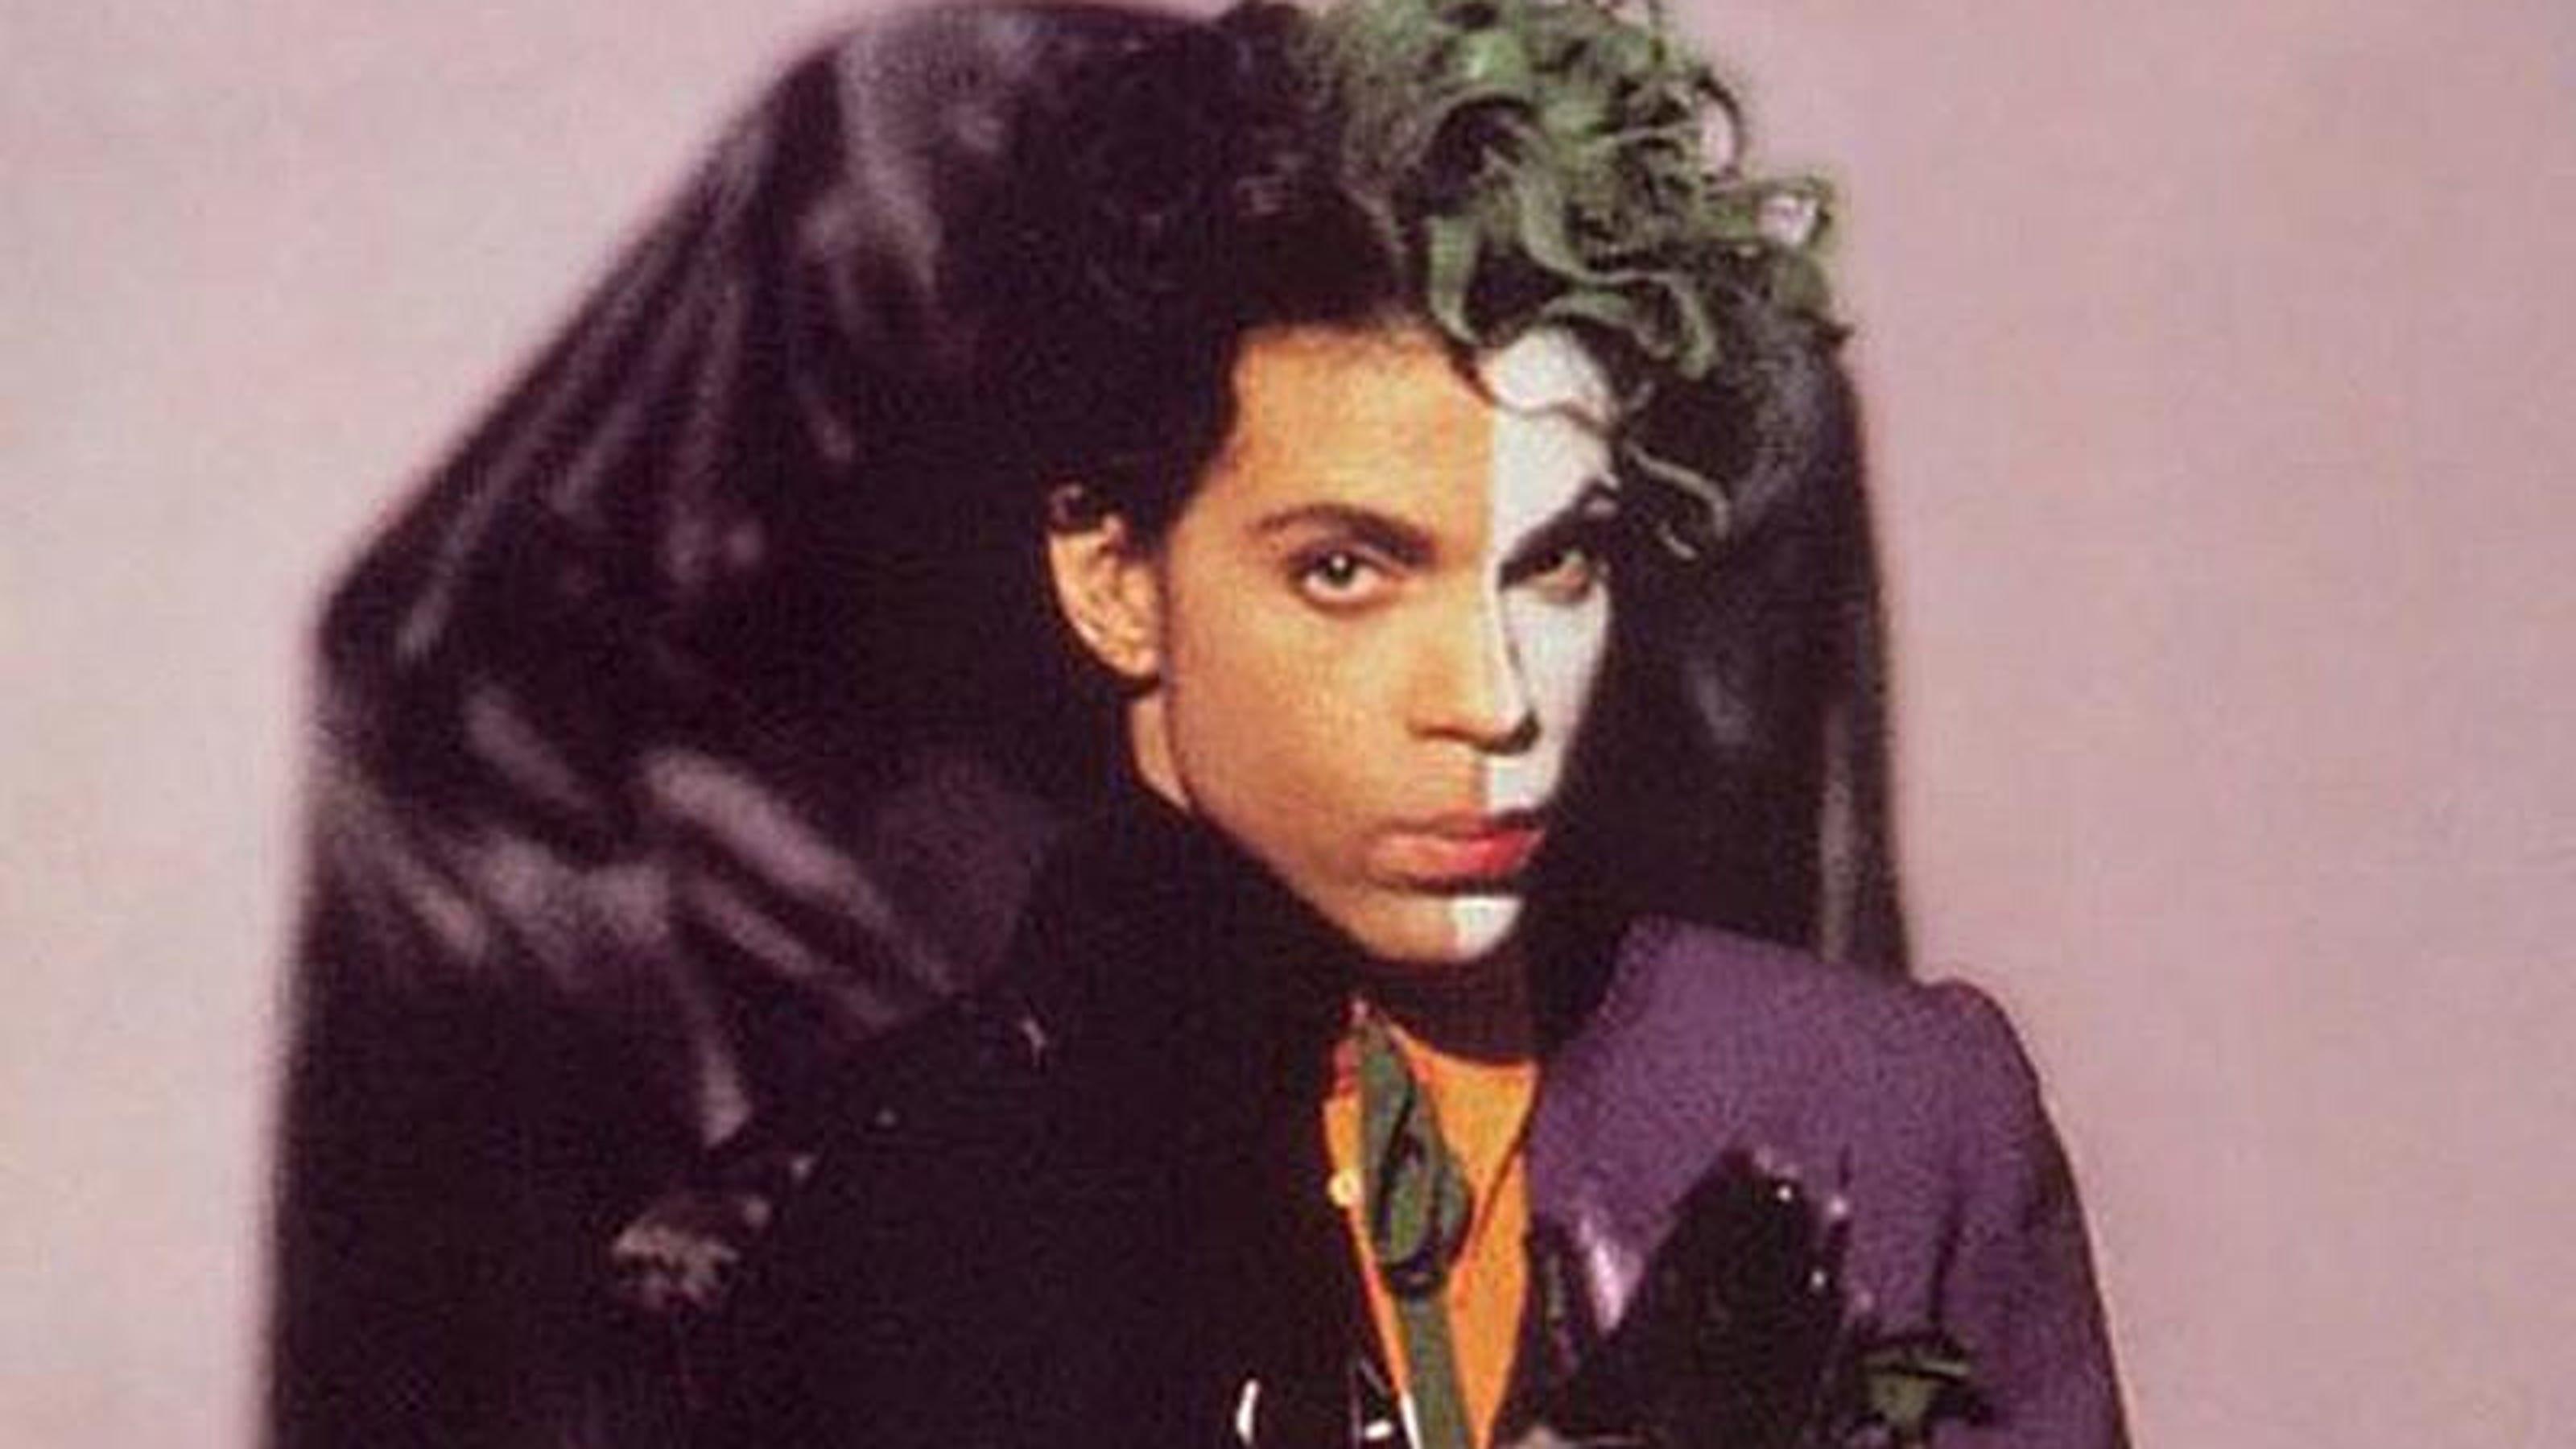 Beyond 'Purple Rain': Finding gems in Prince's catalog